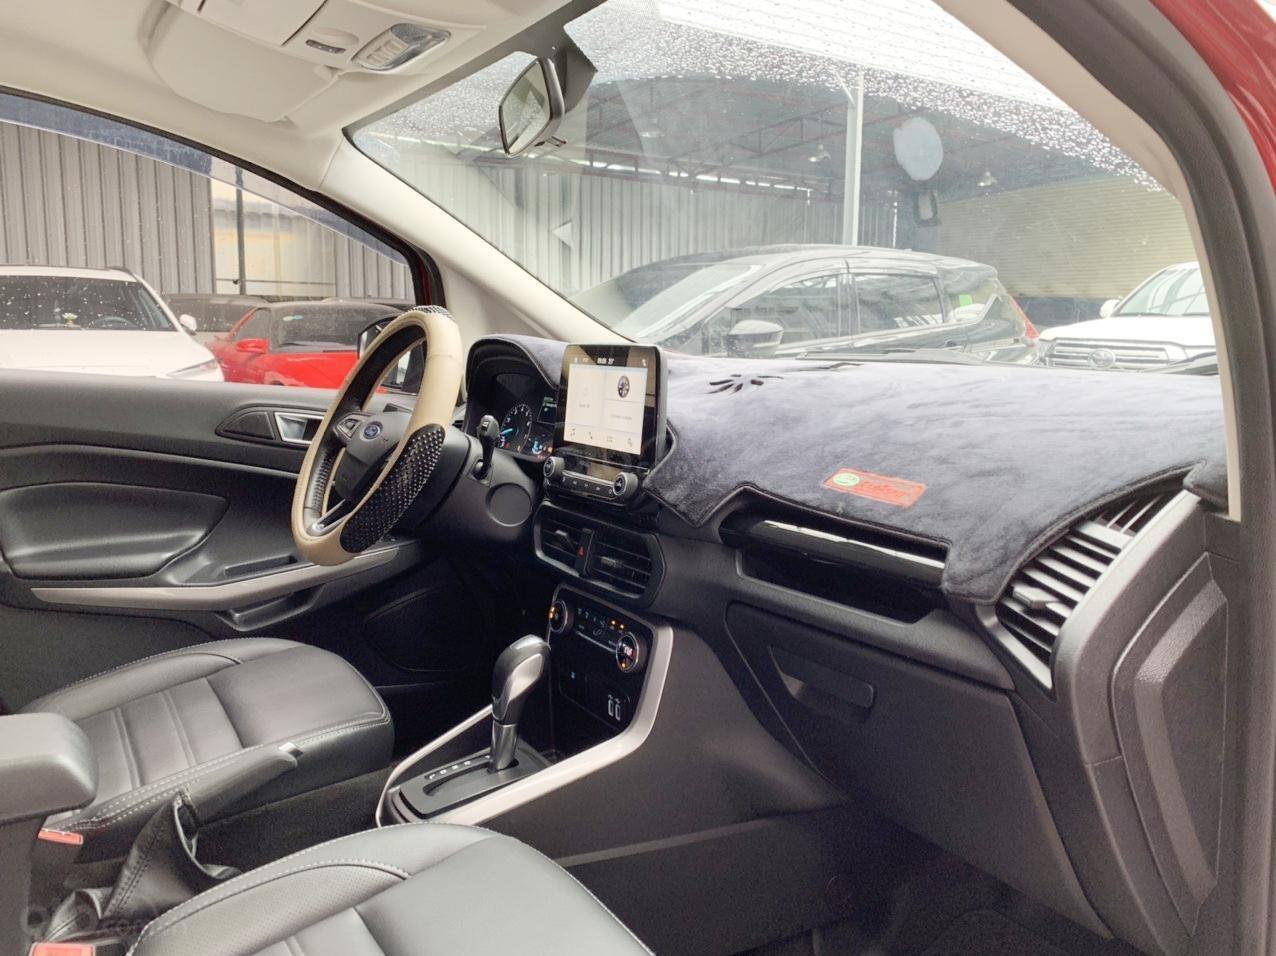 Cần bán Ford Ecosport 1.5 Titanium, sản xuất 2019 (7)